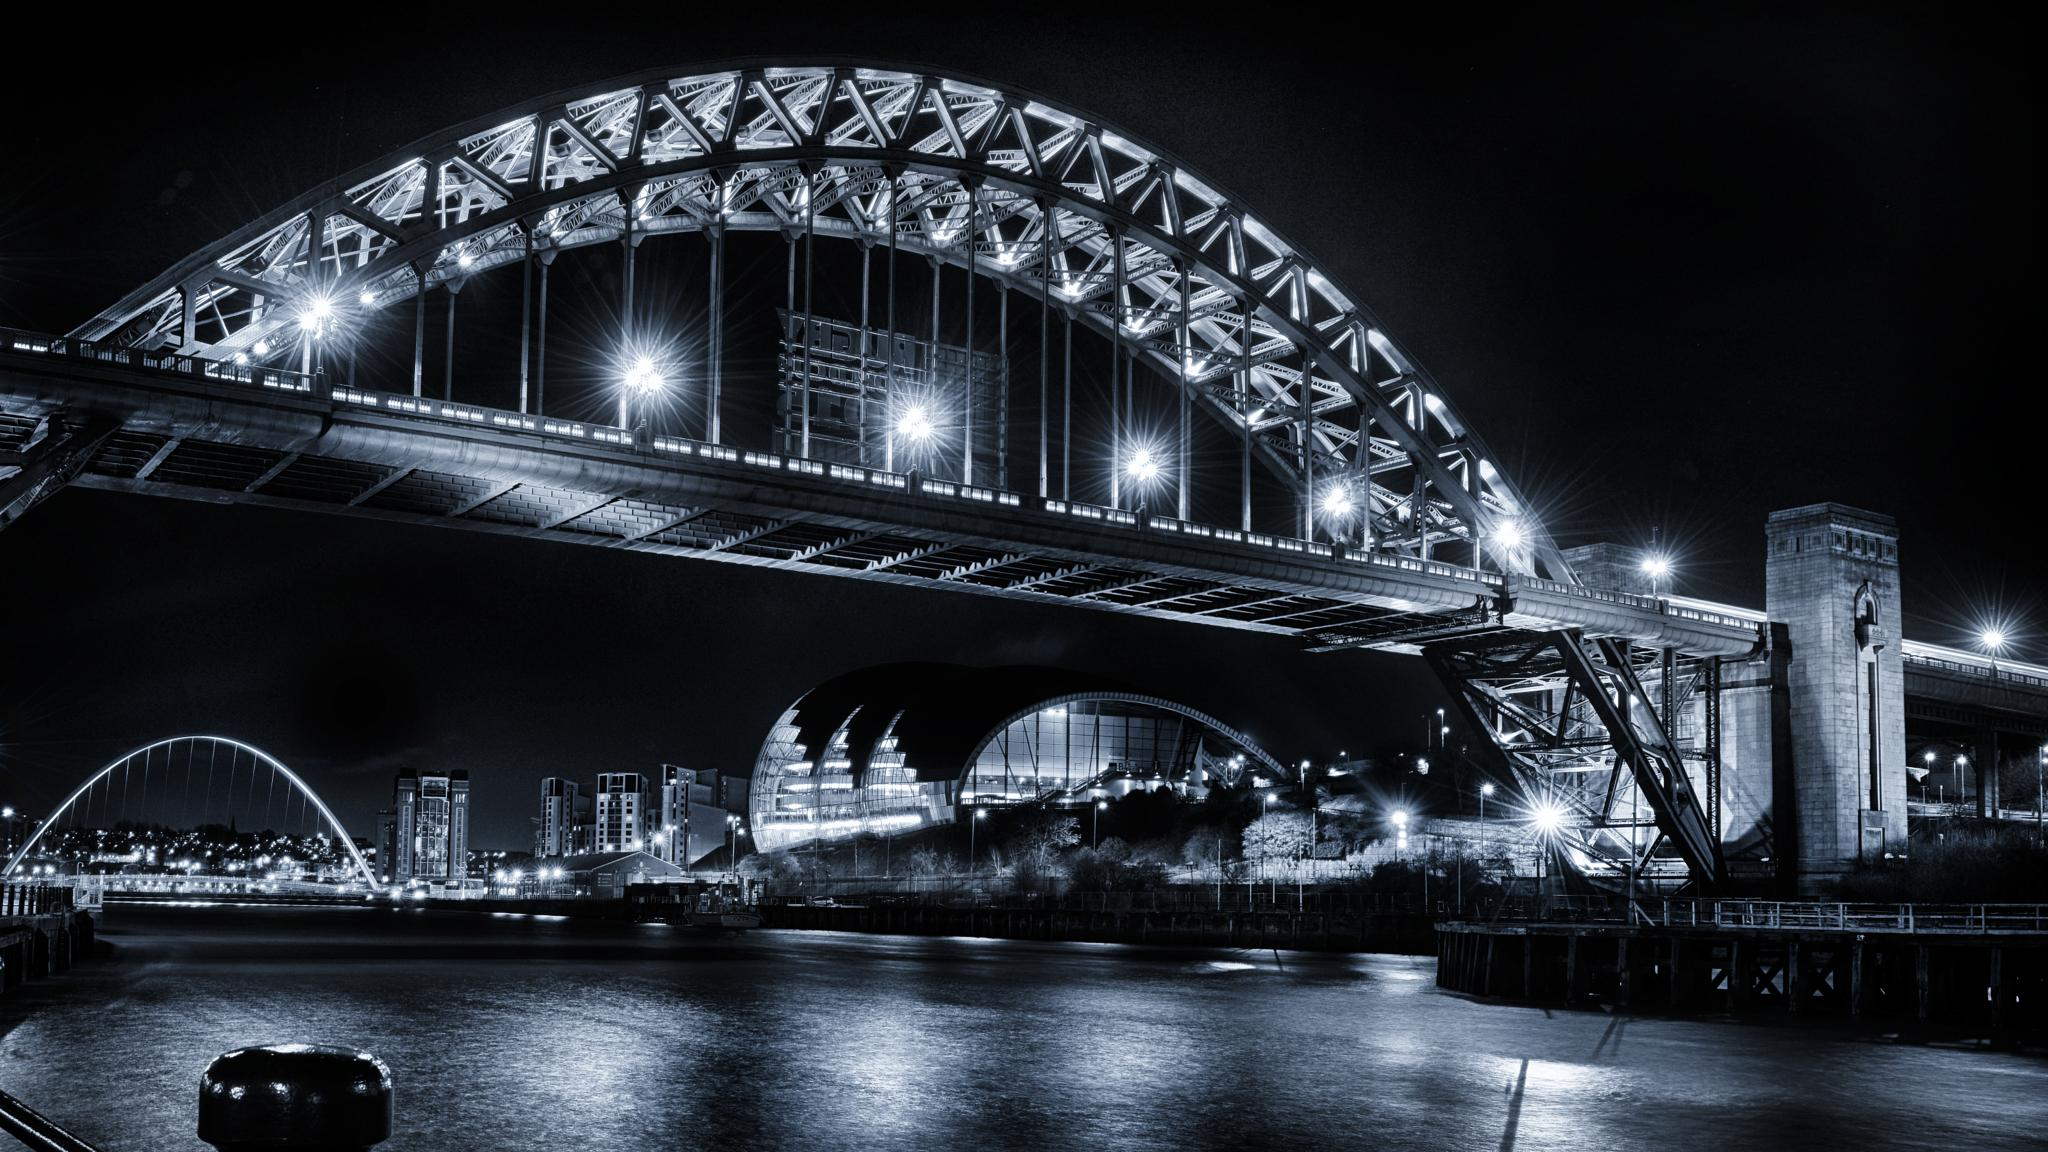 Newcastle by goodadvice.com